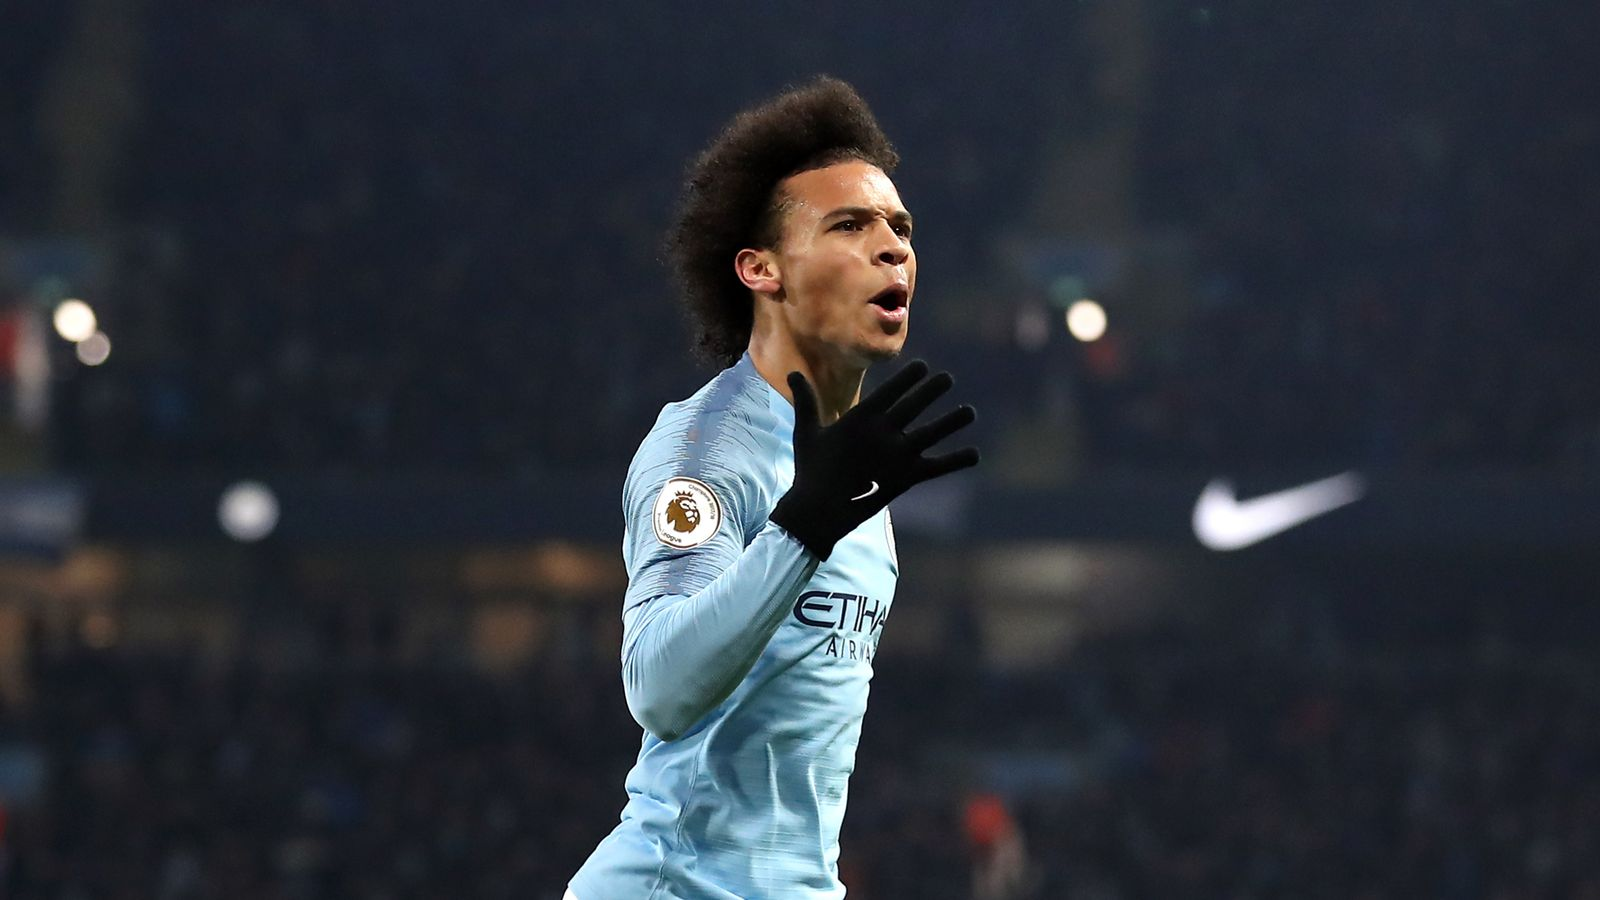 95fbcf85669d Man City 2 - 1 Liverpool - Match Report   Highlights